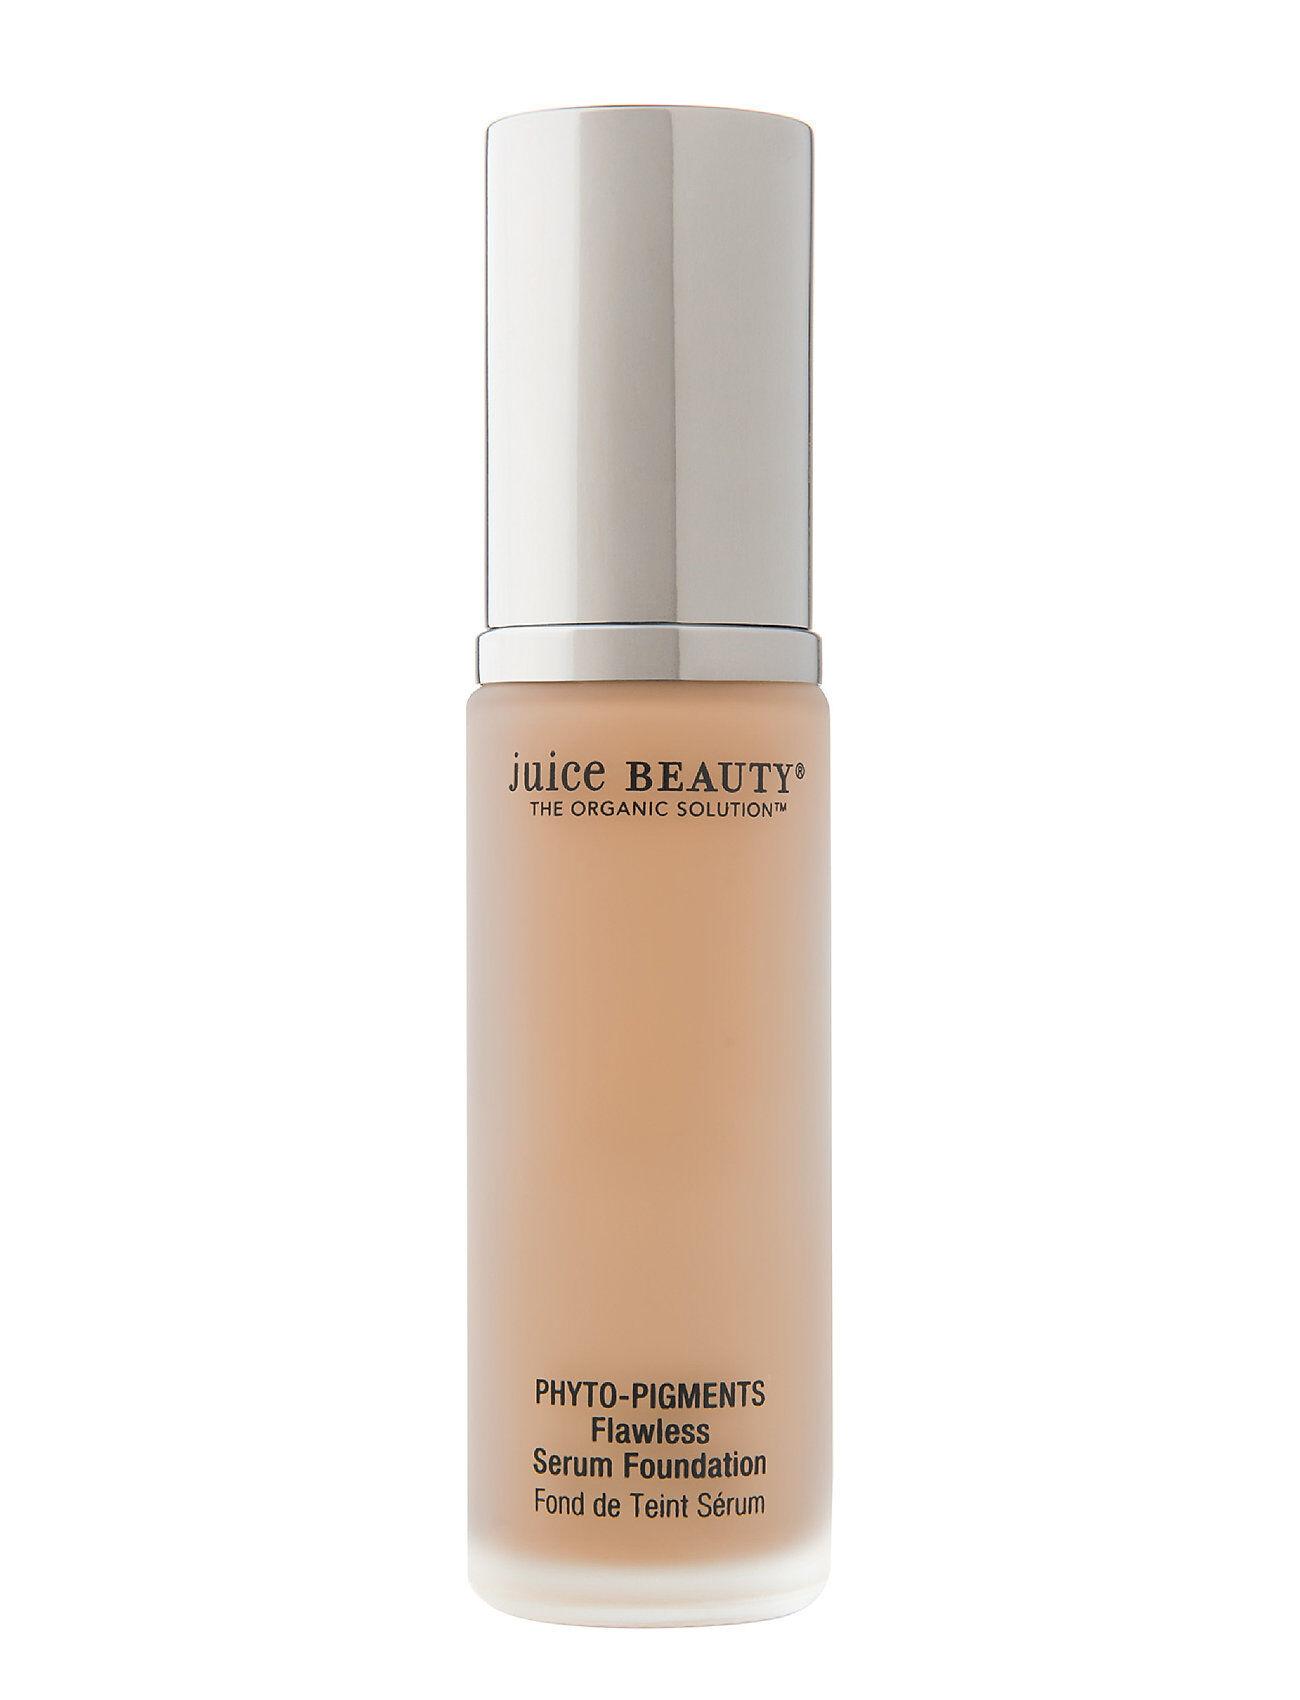 Juice Beauty Flawless Serum Foundation - 17 Medium Tan